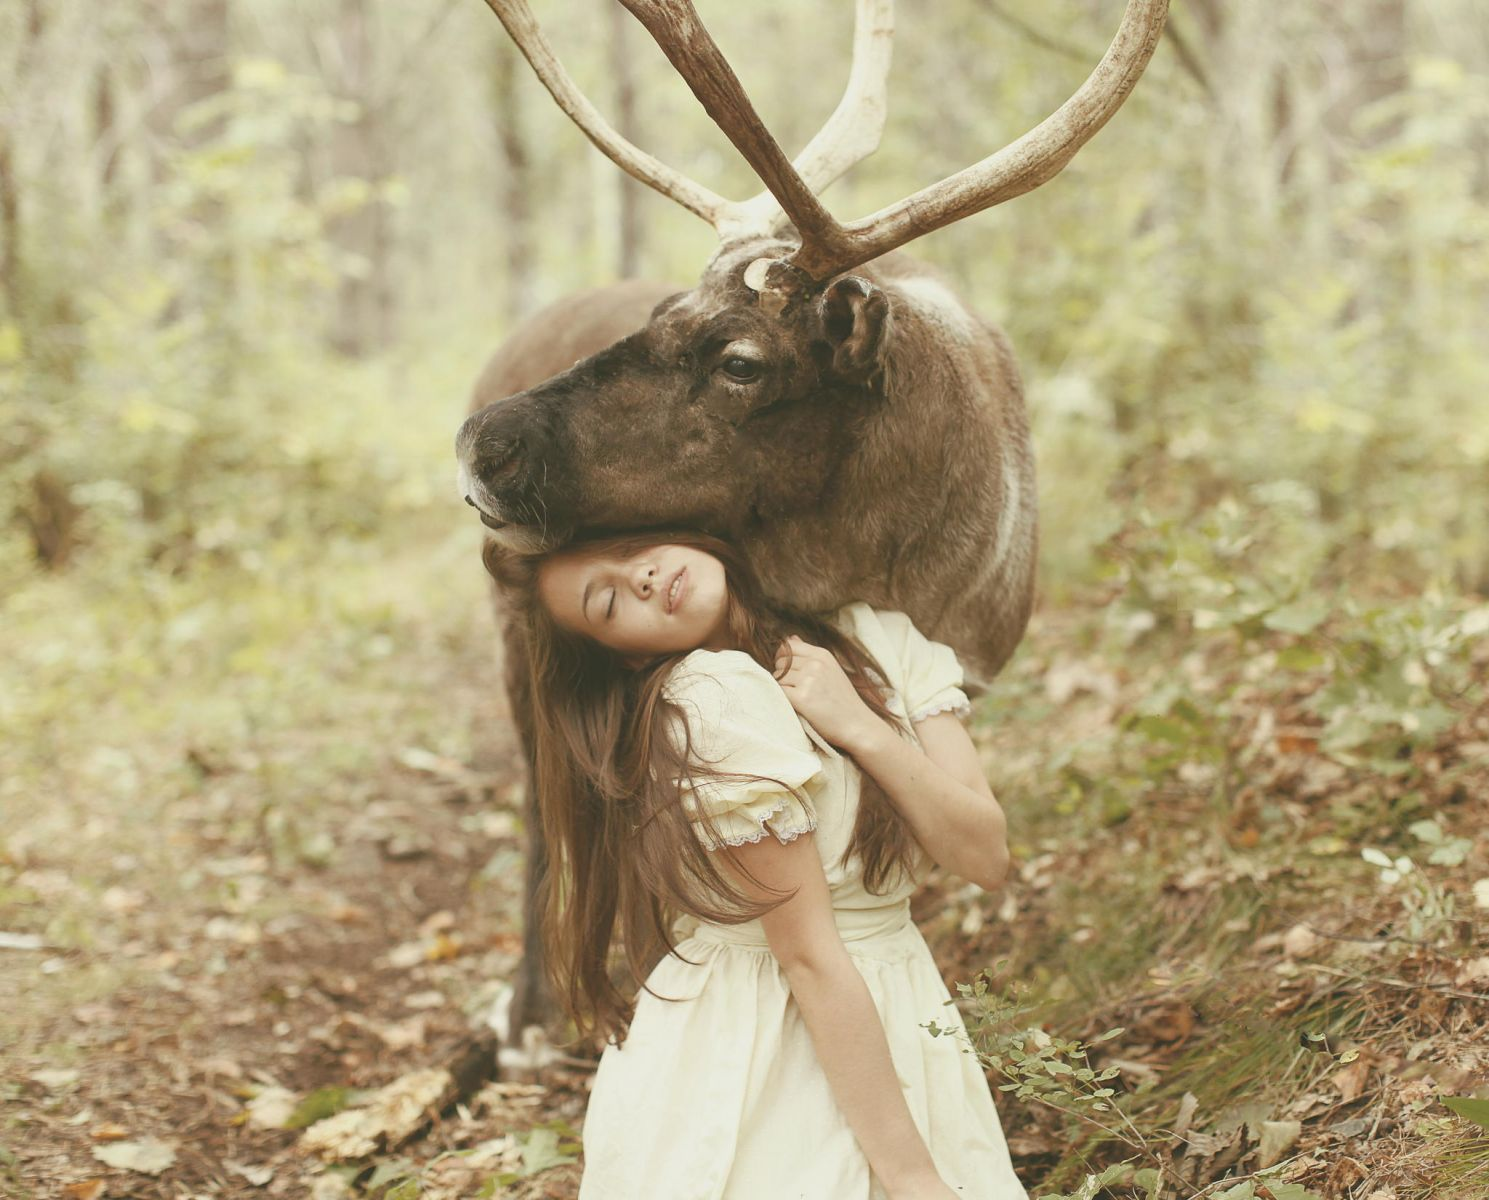 girl fuck animal KATERINA PLOTNIKOVA'S FAIRY TALE PHOTOGRAPHY OF YOUNG WOMEN & DANGEROUS  ANIMALS